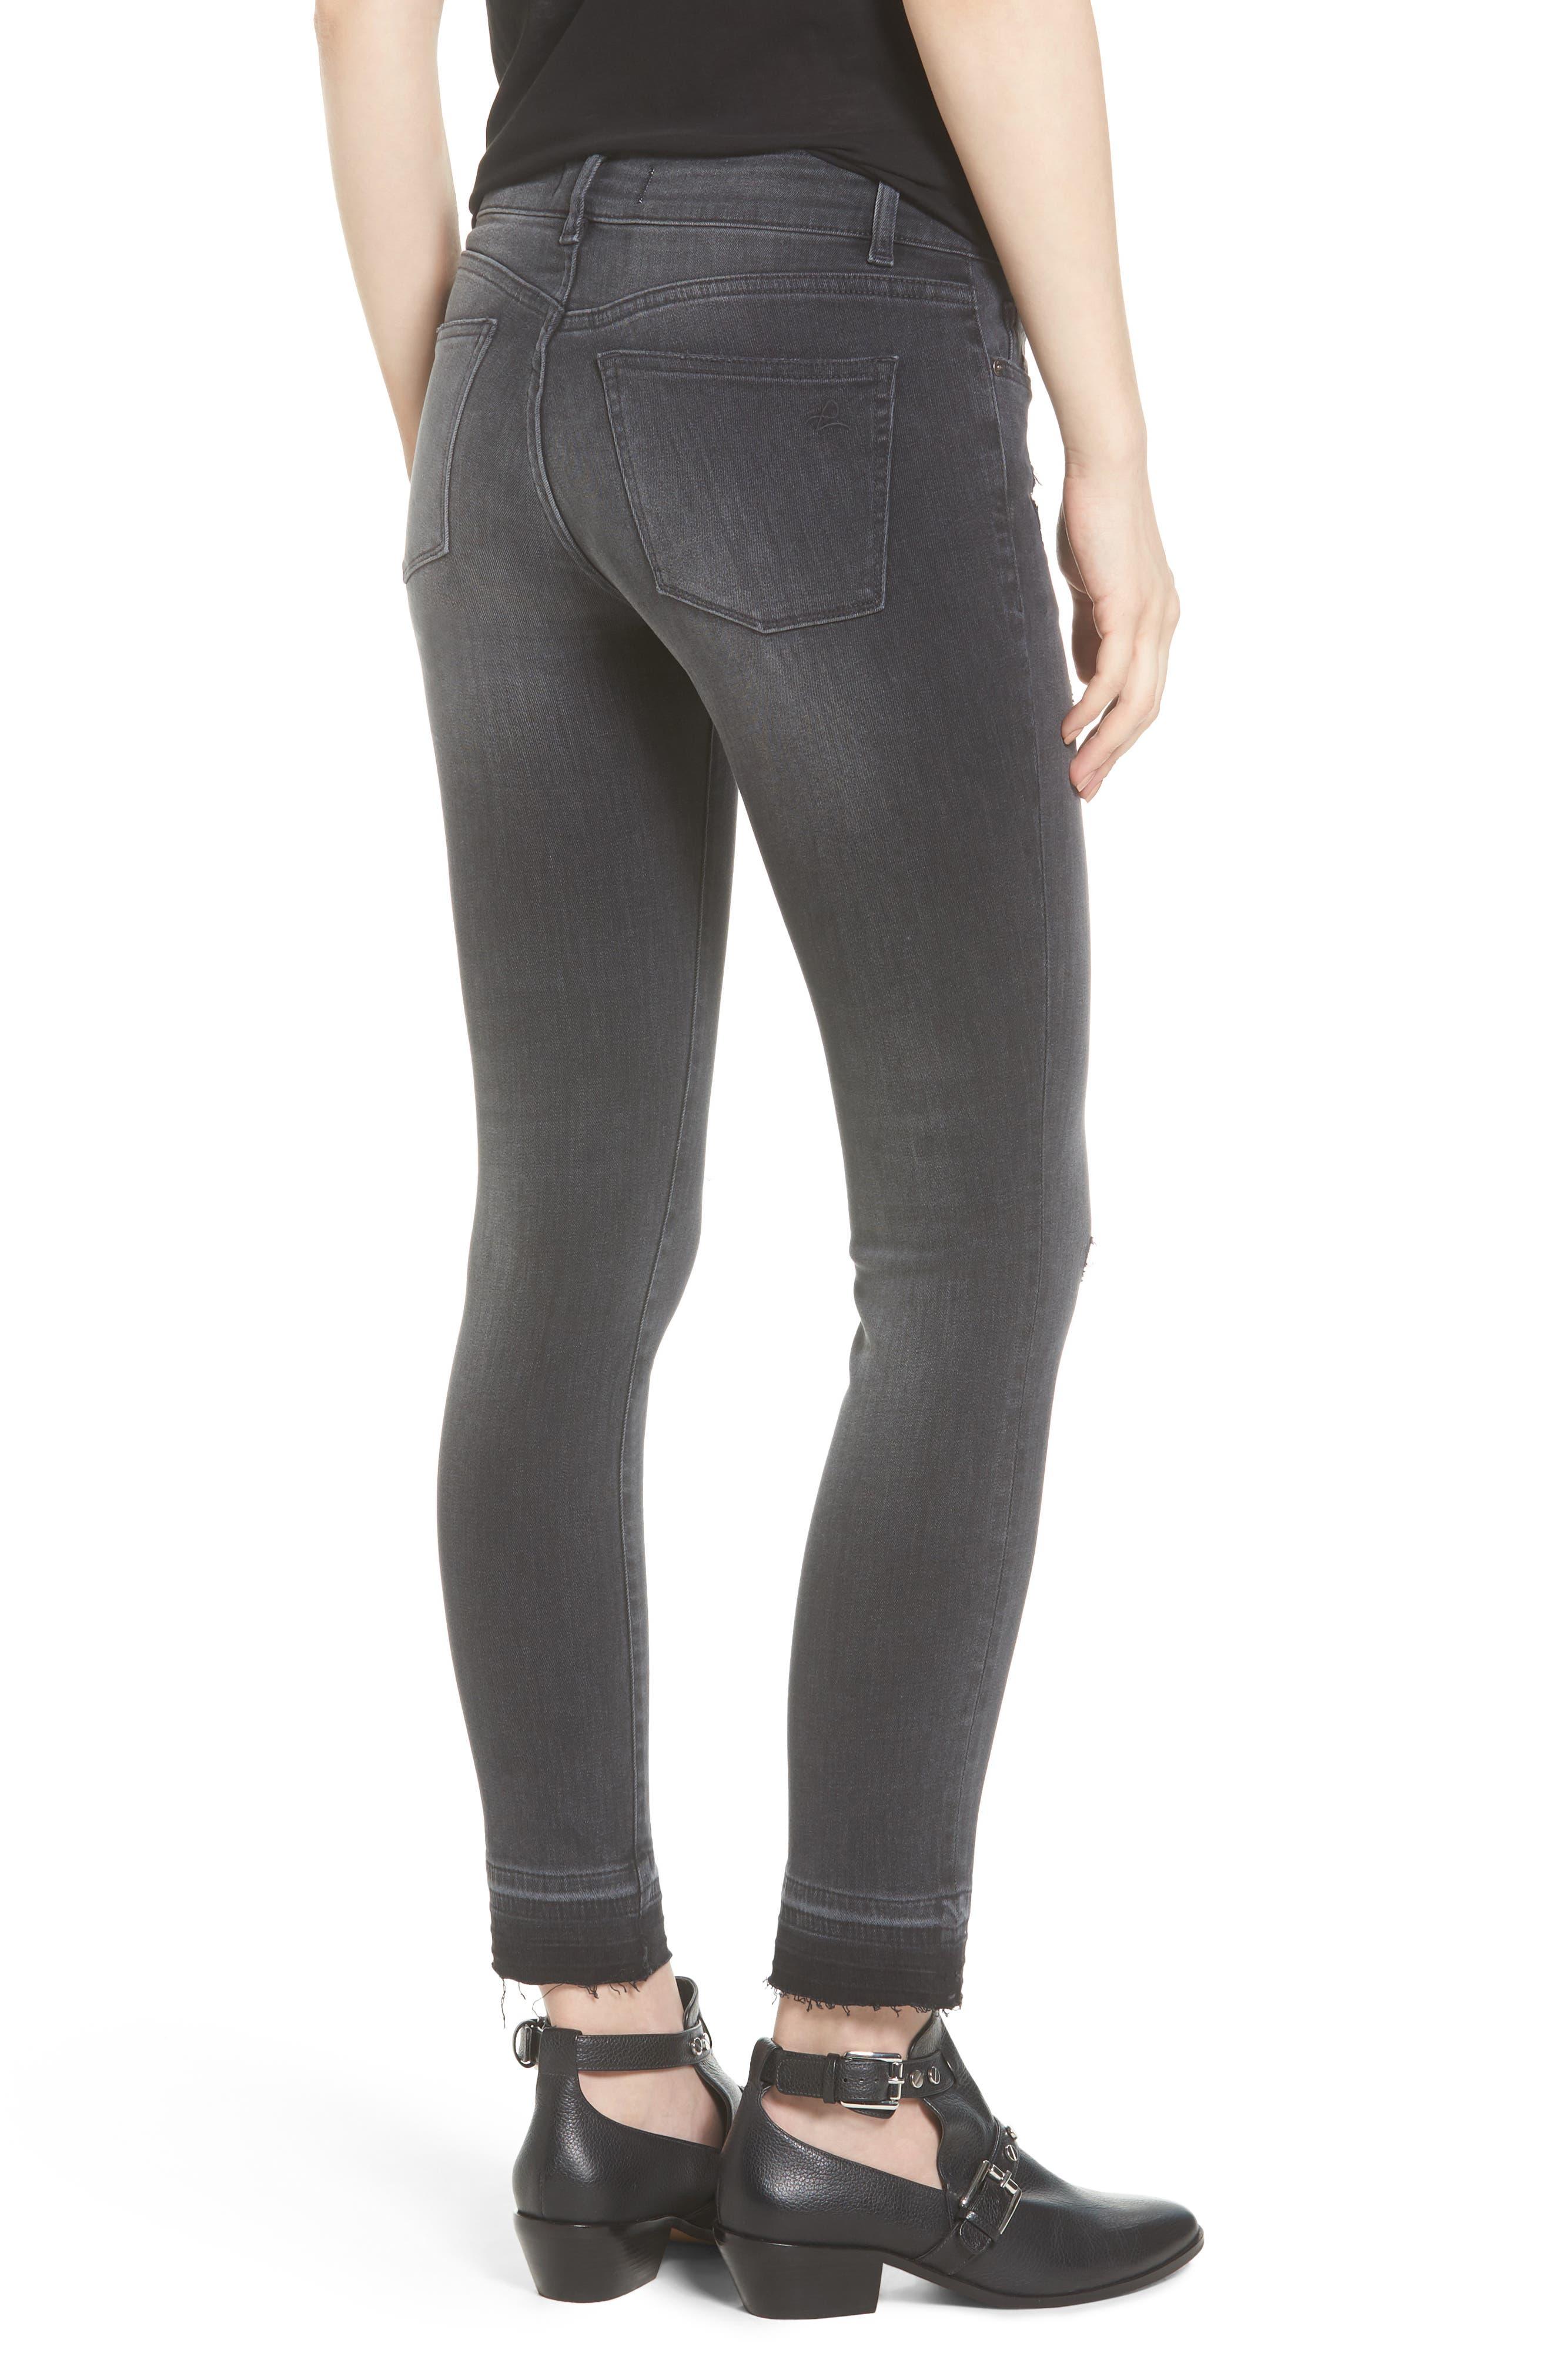 Alternate Image 2  - DL1961 Emma Power Legging Jeans (Seneca)